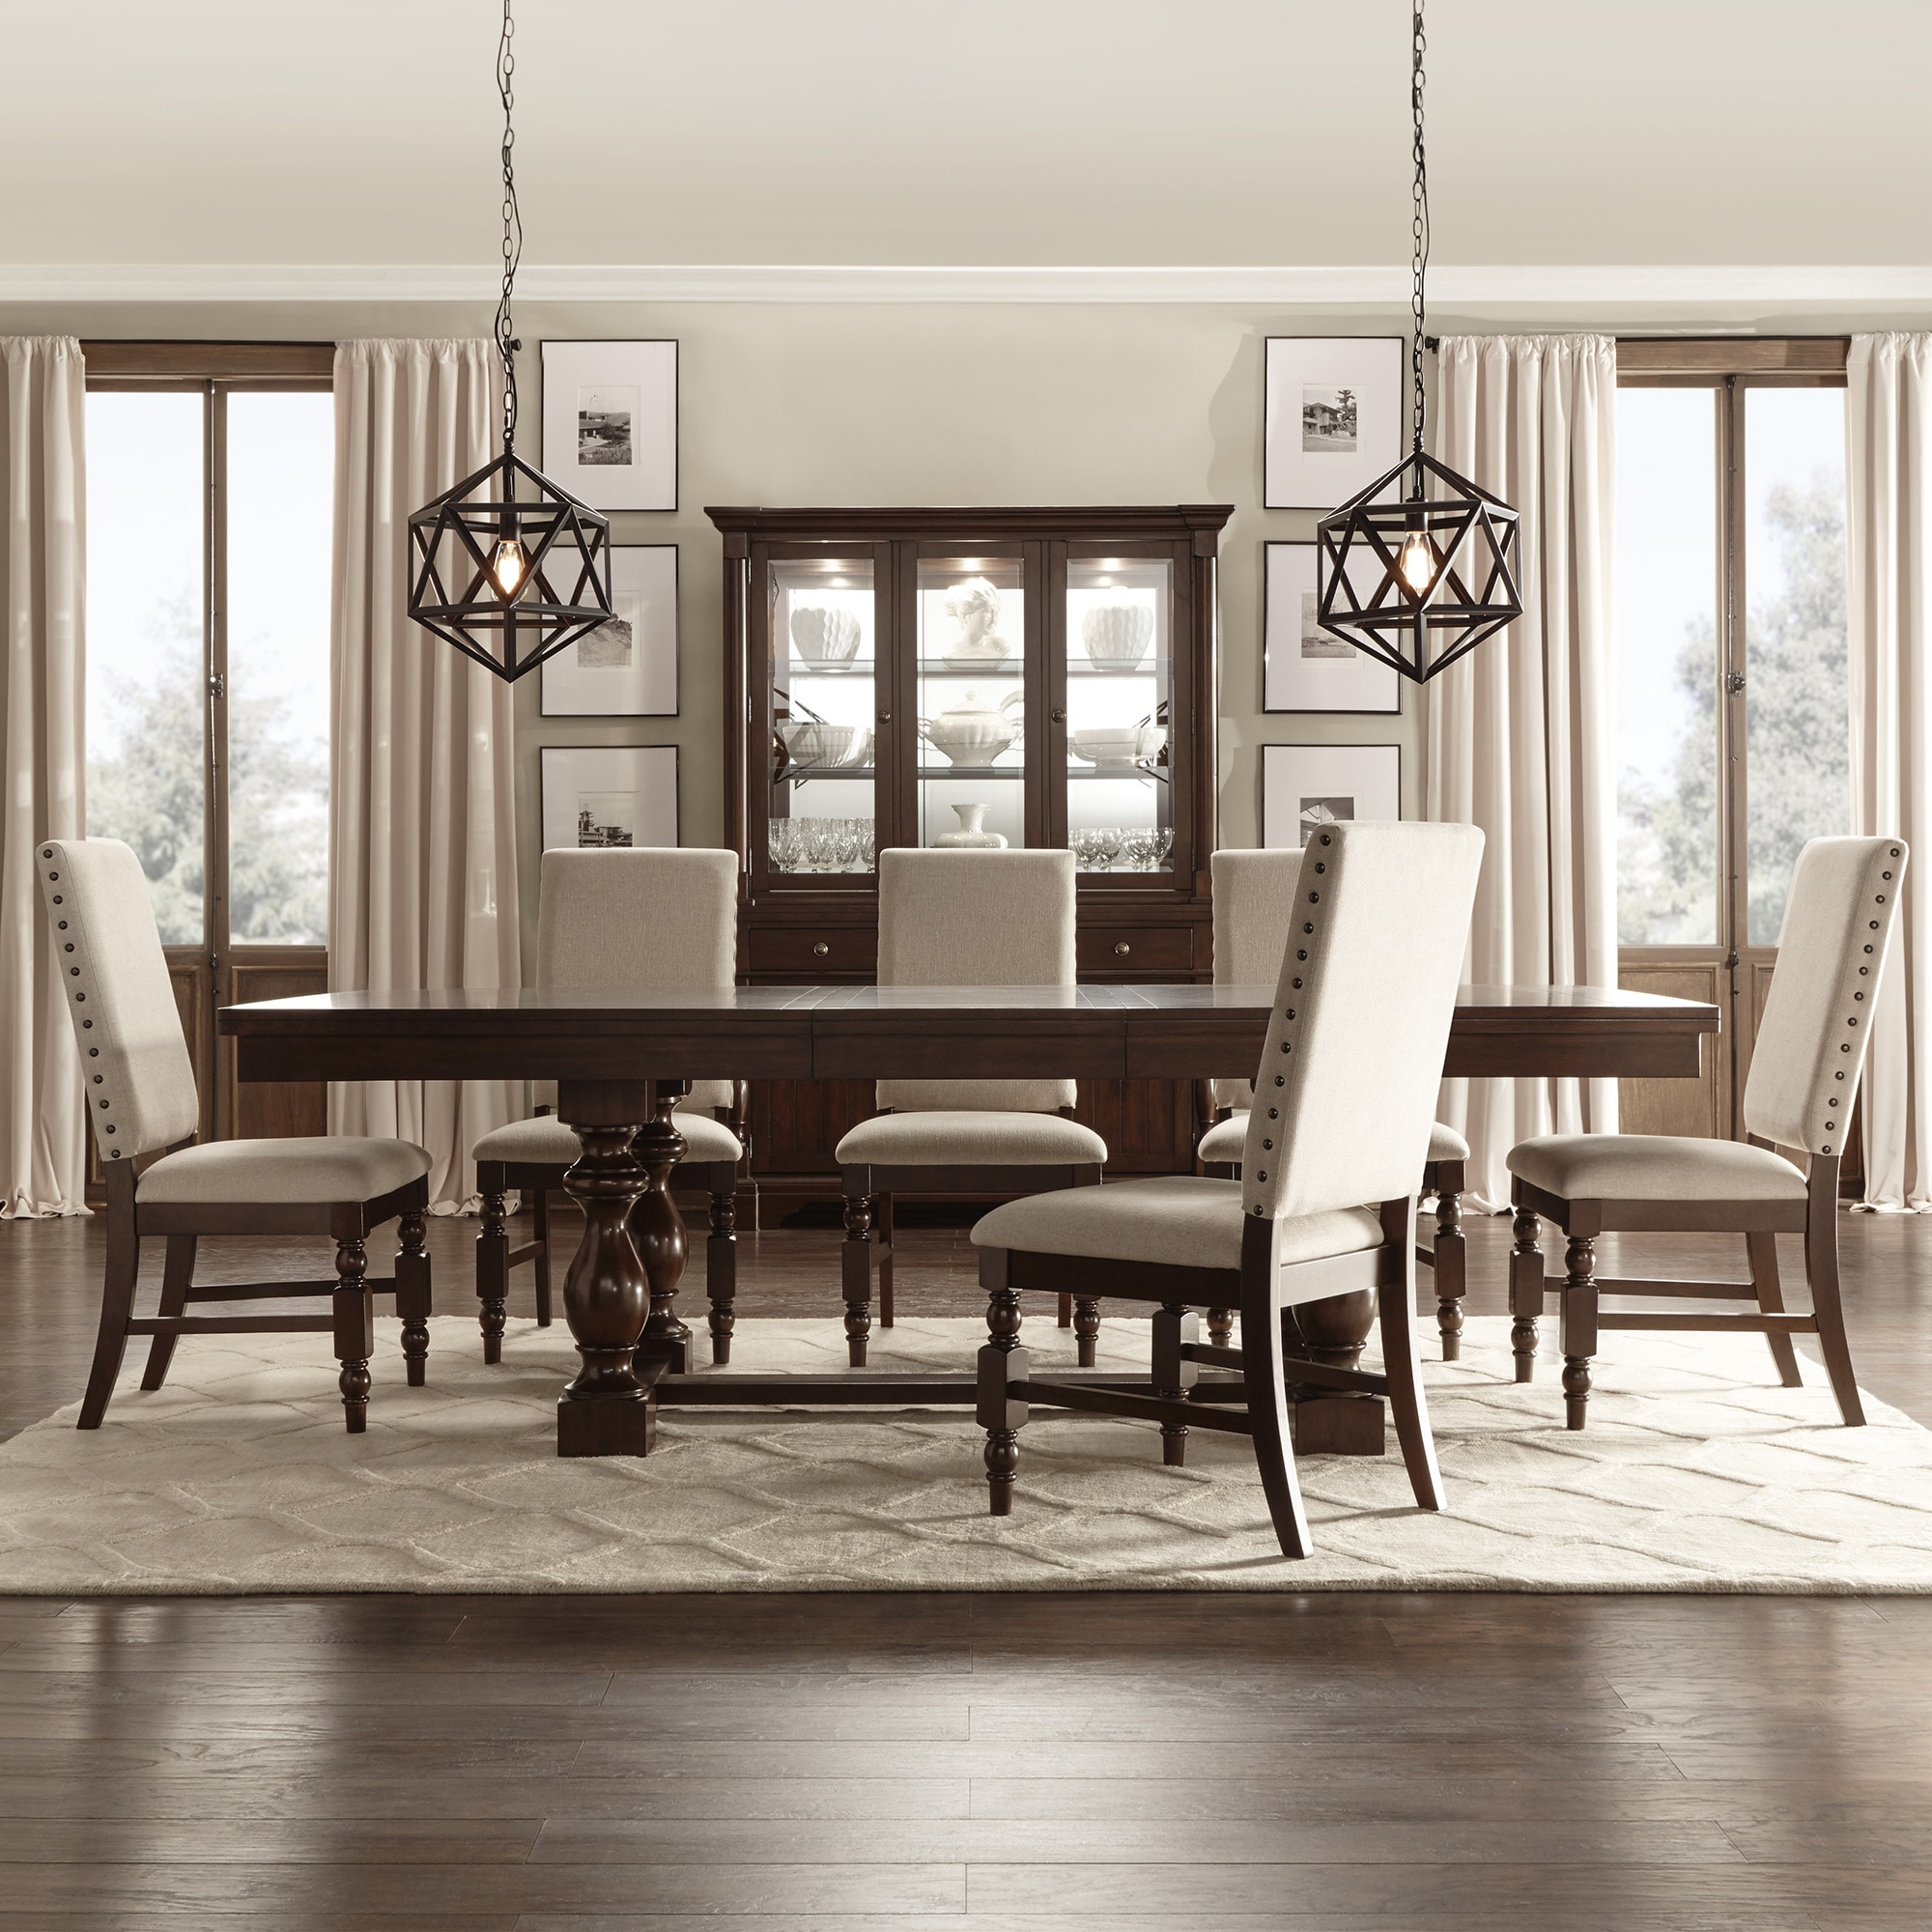 buy kitchen dining room sets online at overstock com our best rh overstock com tufted dining room chairs overstock Overstock Dining Room Tables